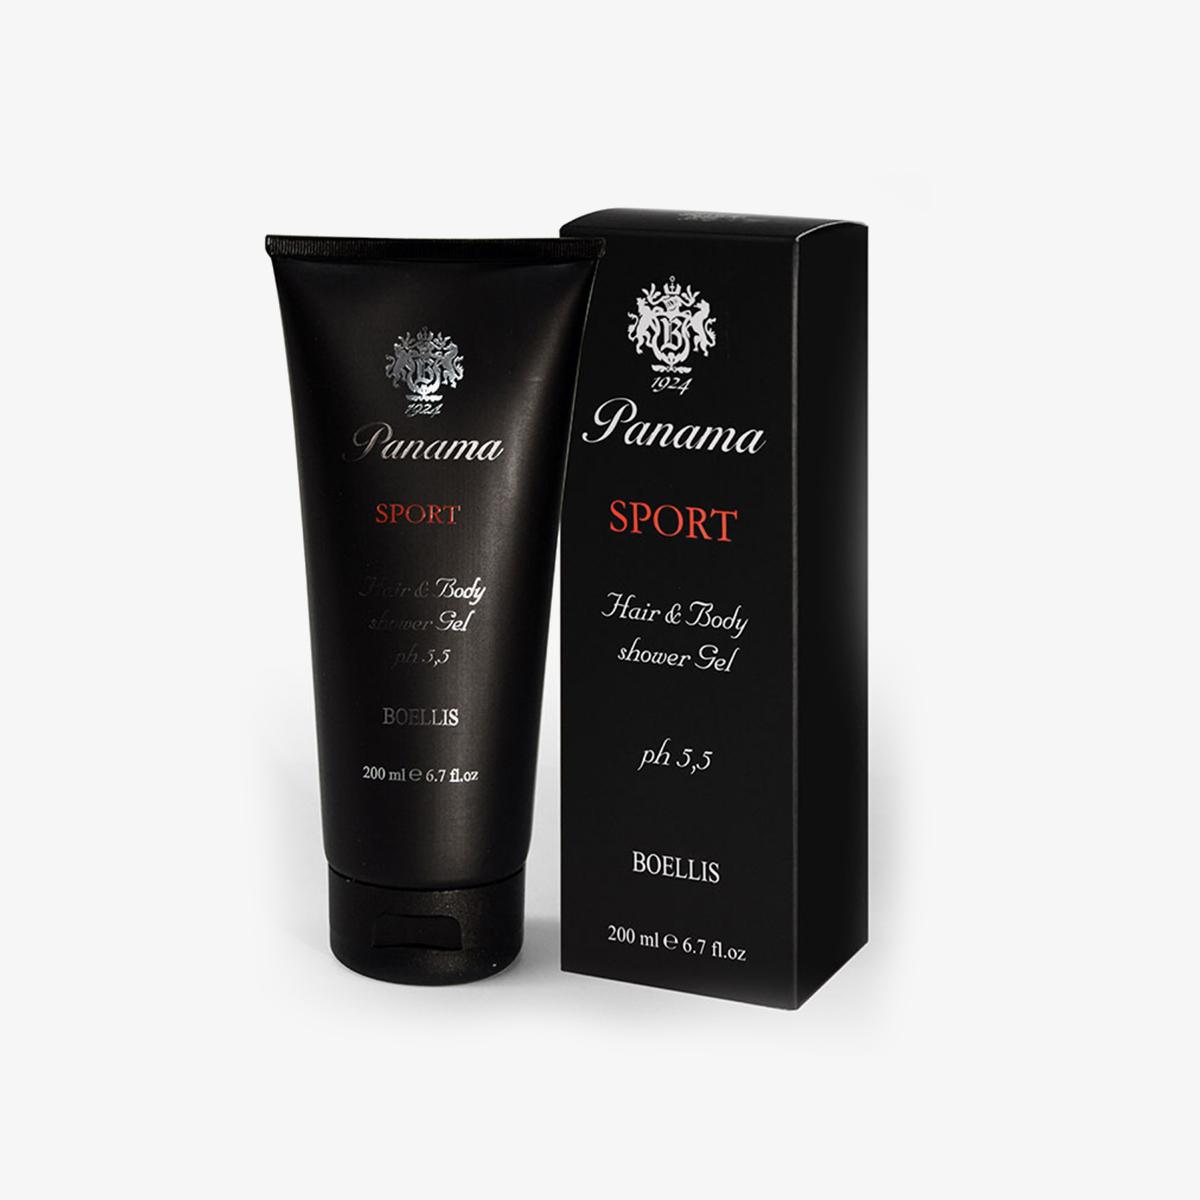 PANAMA Boellis – SPORT Hair & Body Shower Gel 200 Ml